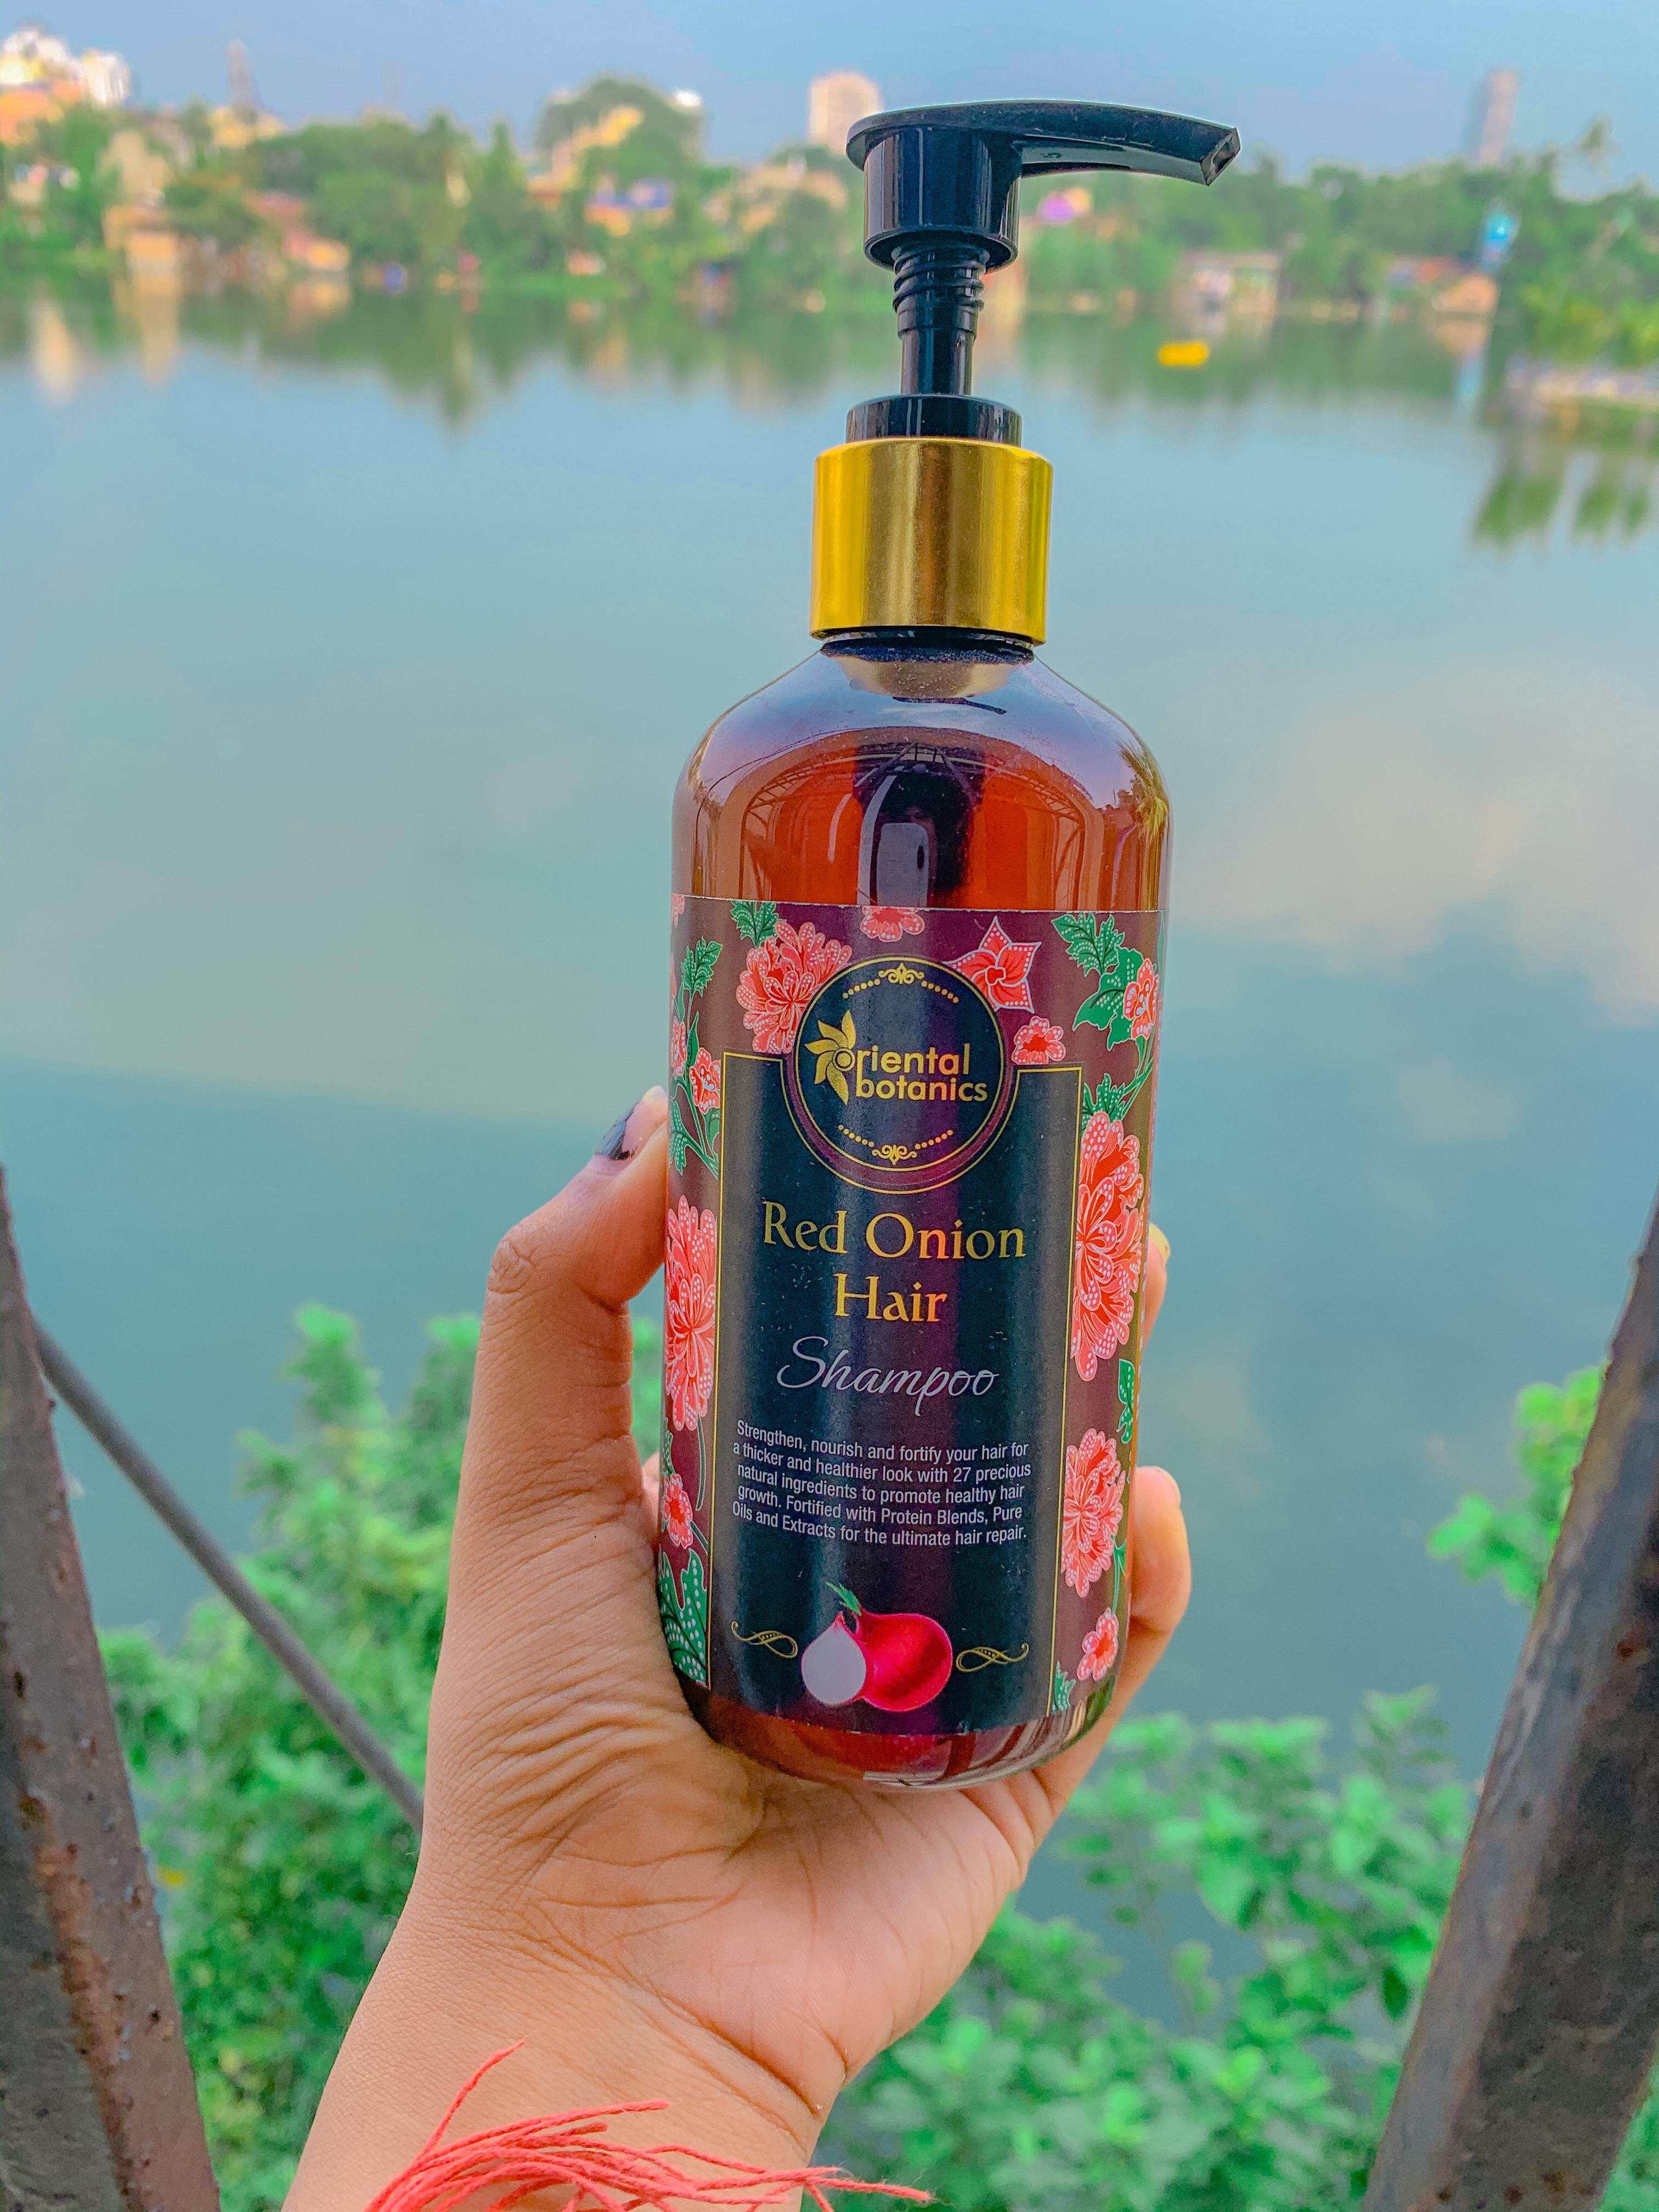 Oriental Botanics Red Onion Hair Shampoo-Adds volume to hair-By arunikakoley-1